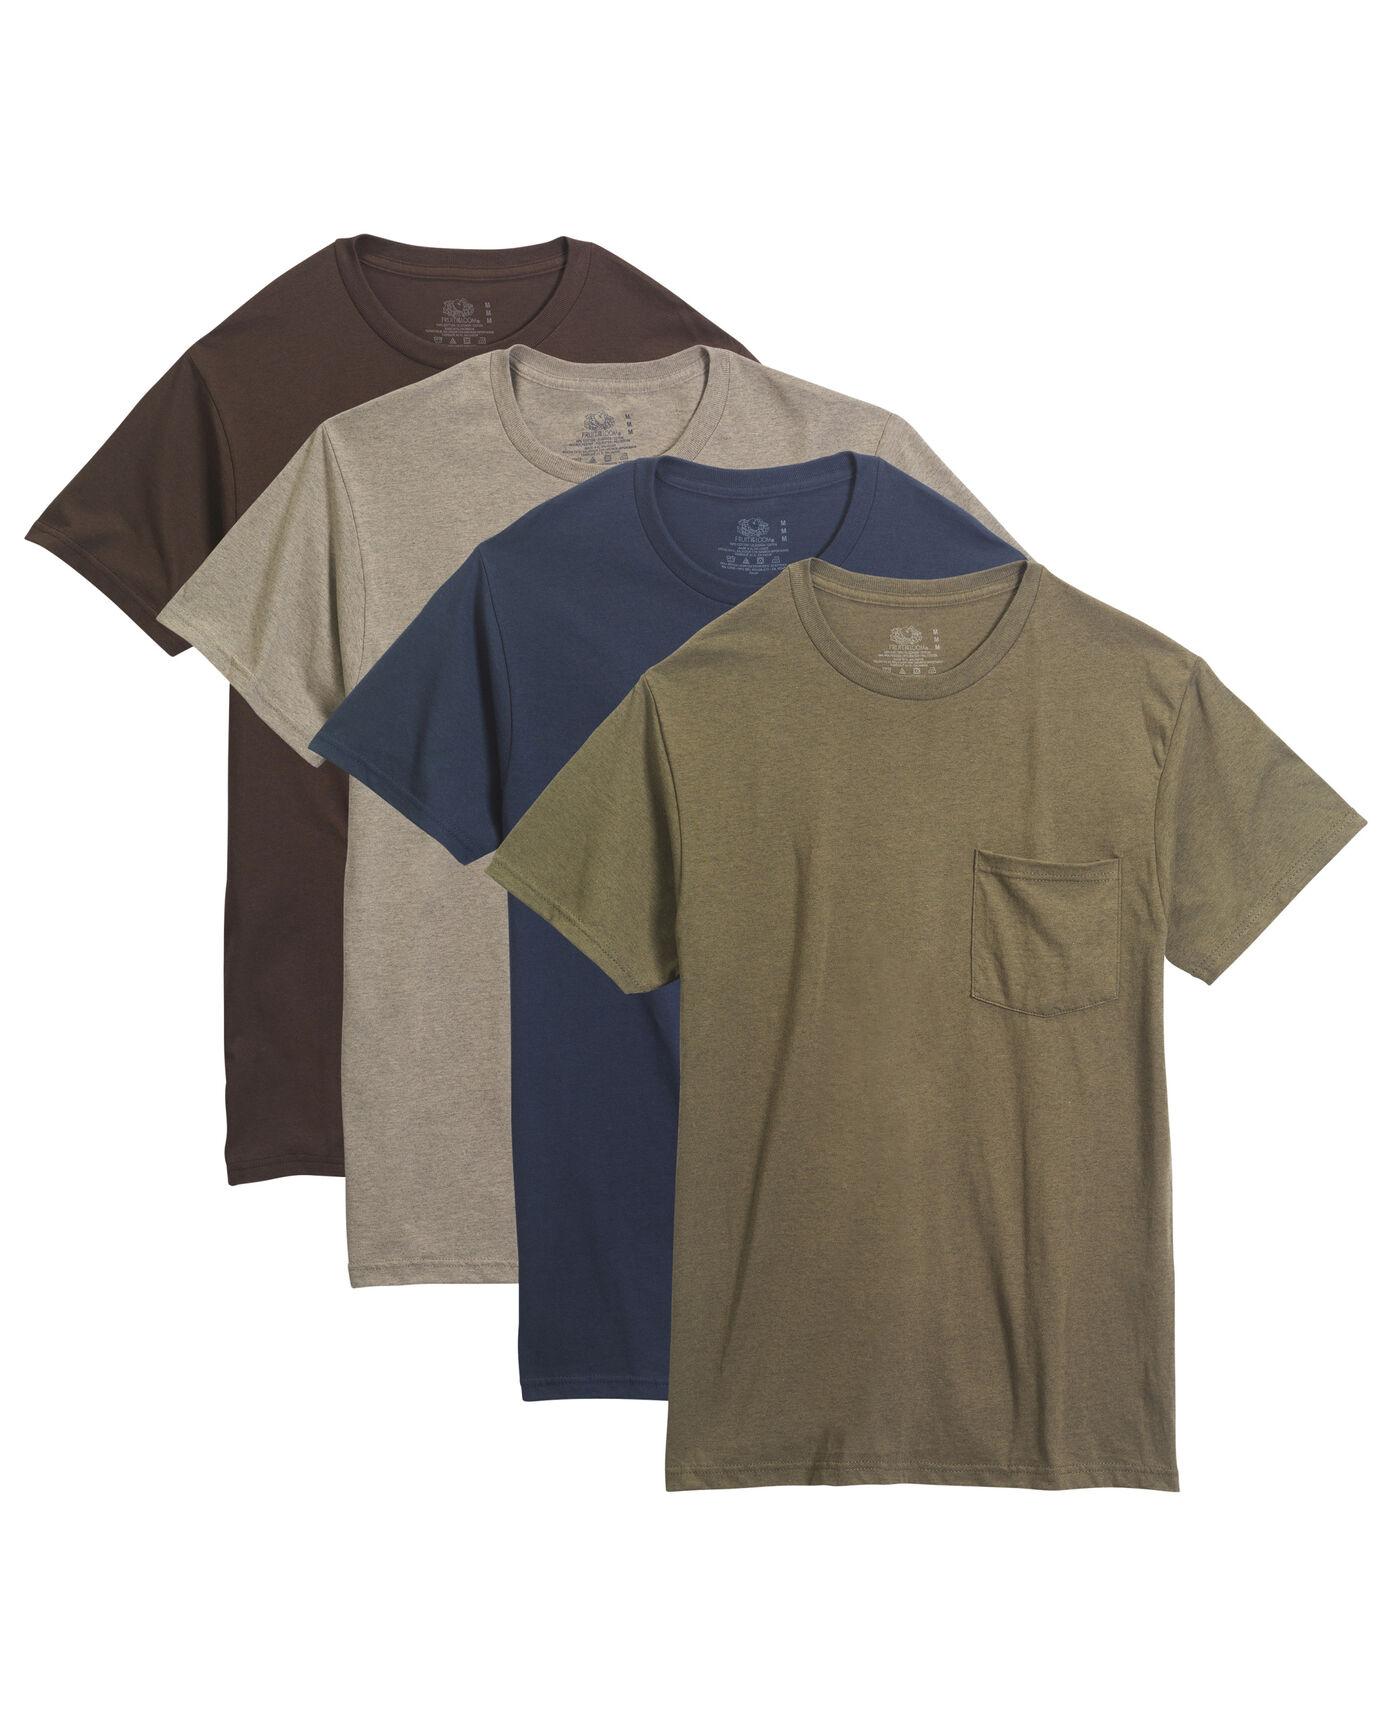 caa34d43e Girls T-Shirts, Graphic Tees & Band Tees | Hot Topic